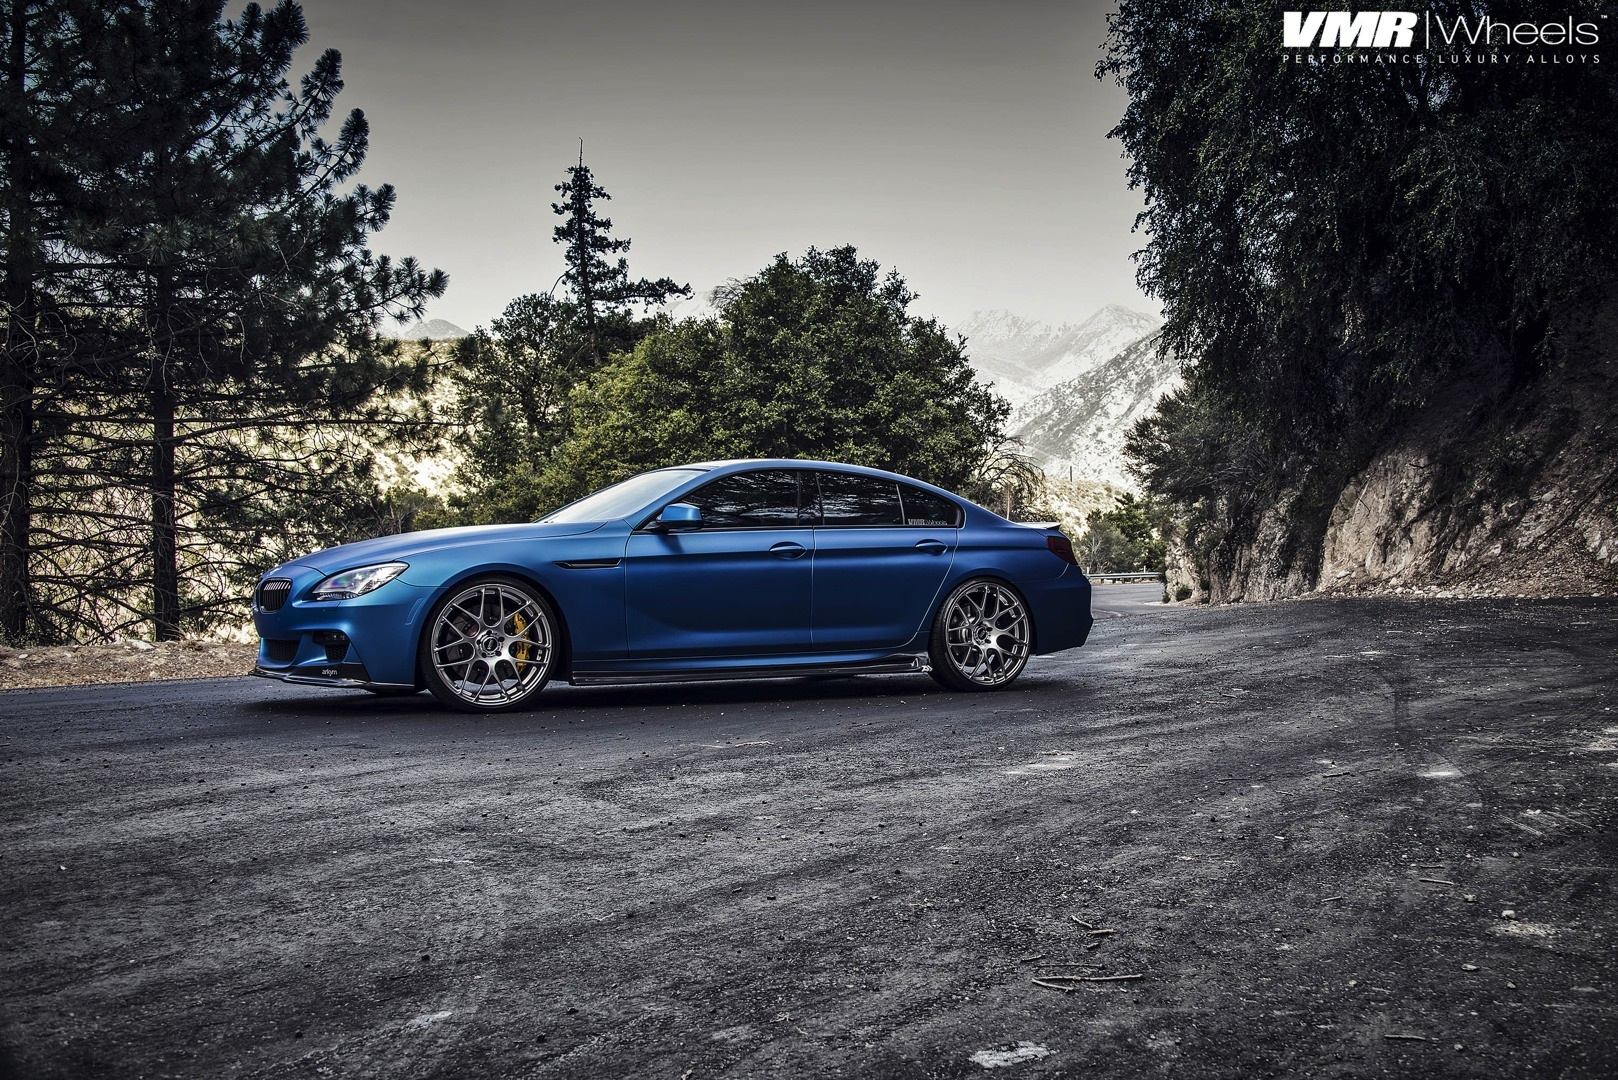 Bmw 640i Gran Coupe Gets Matte Blue Wrap At Eas